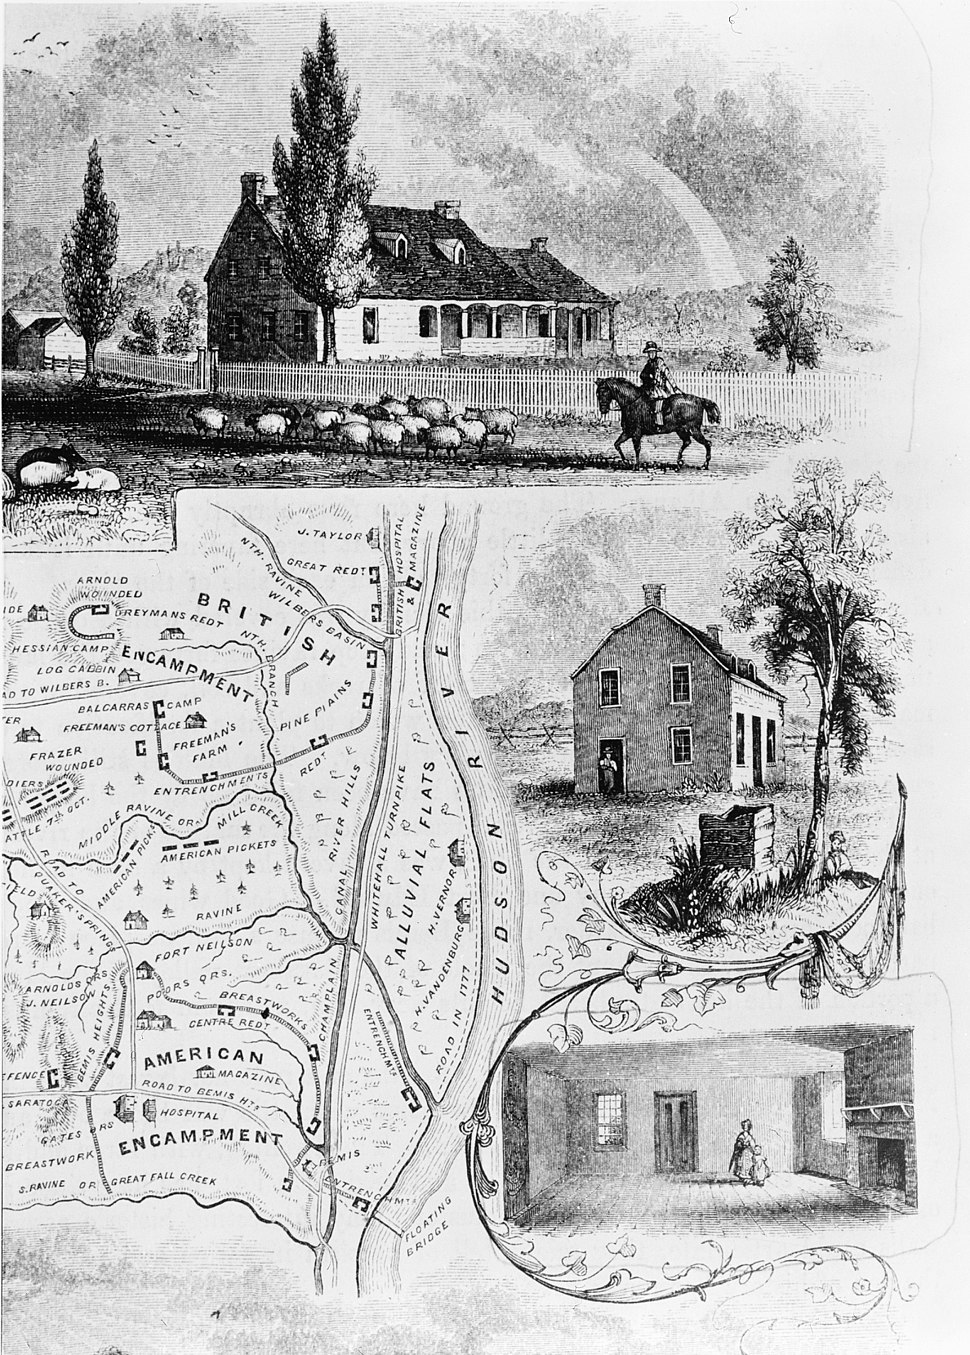 John Neilson House, Bemis Heights, Stillwater, Saratoga County, NY